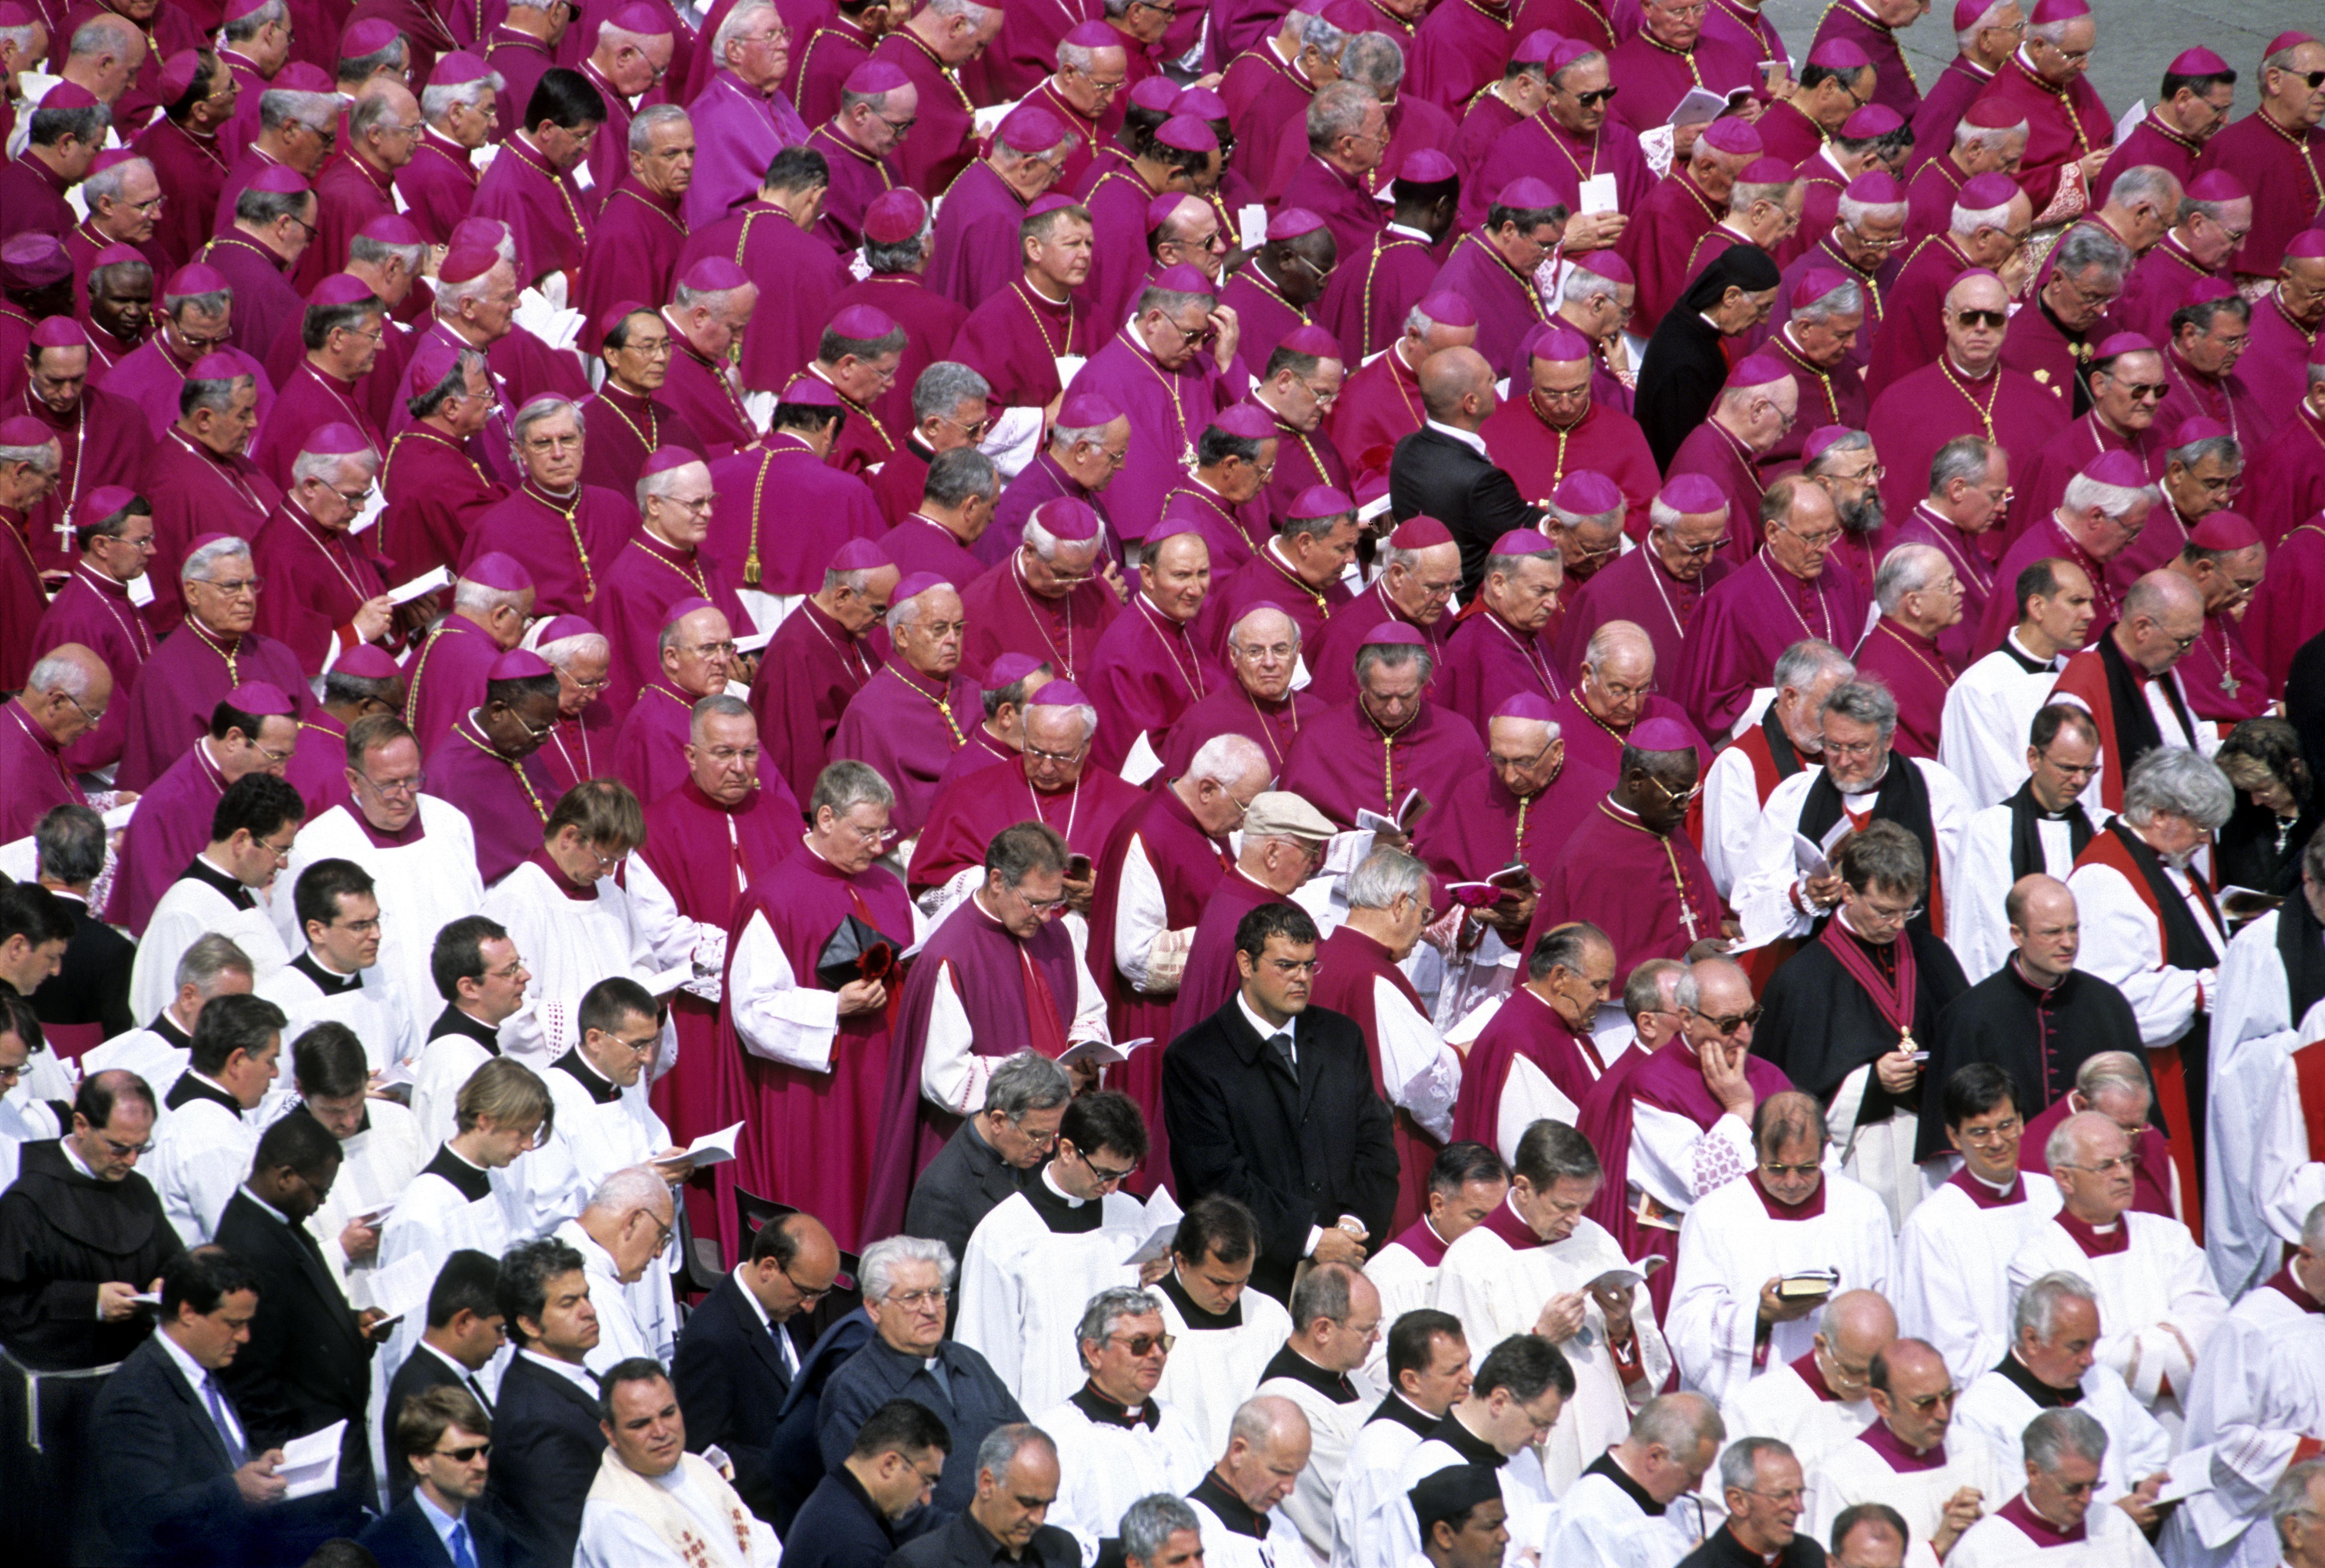 Papst-Instruktion empört deutsche Katholiken